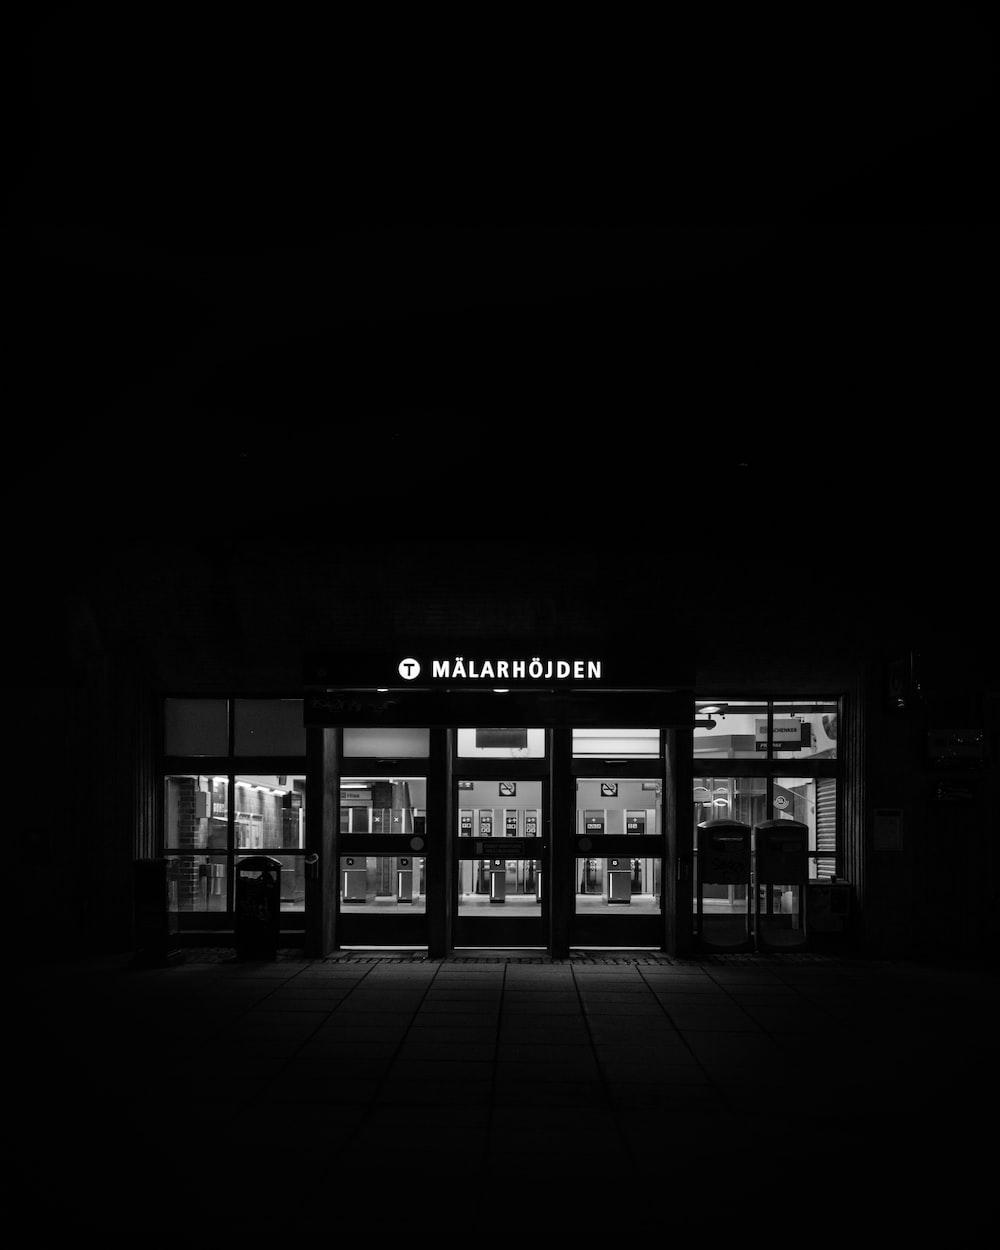 Malarhojden store at night time